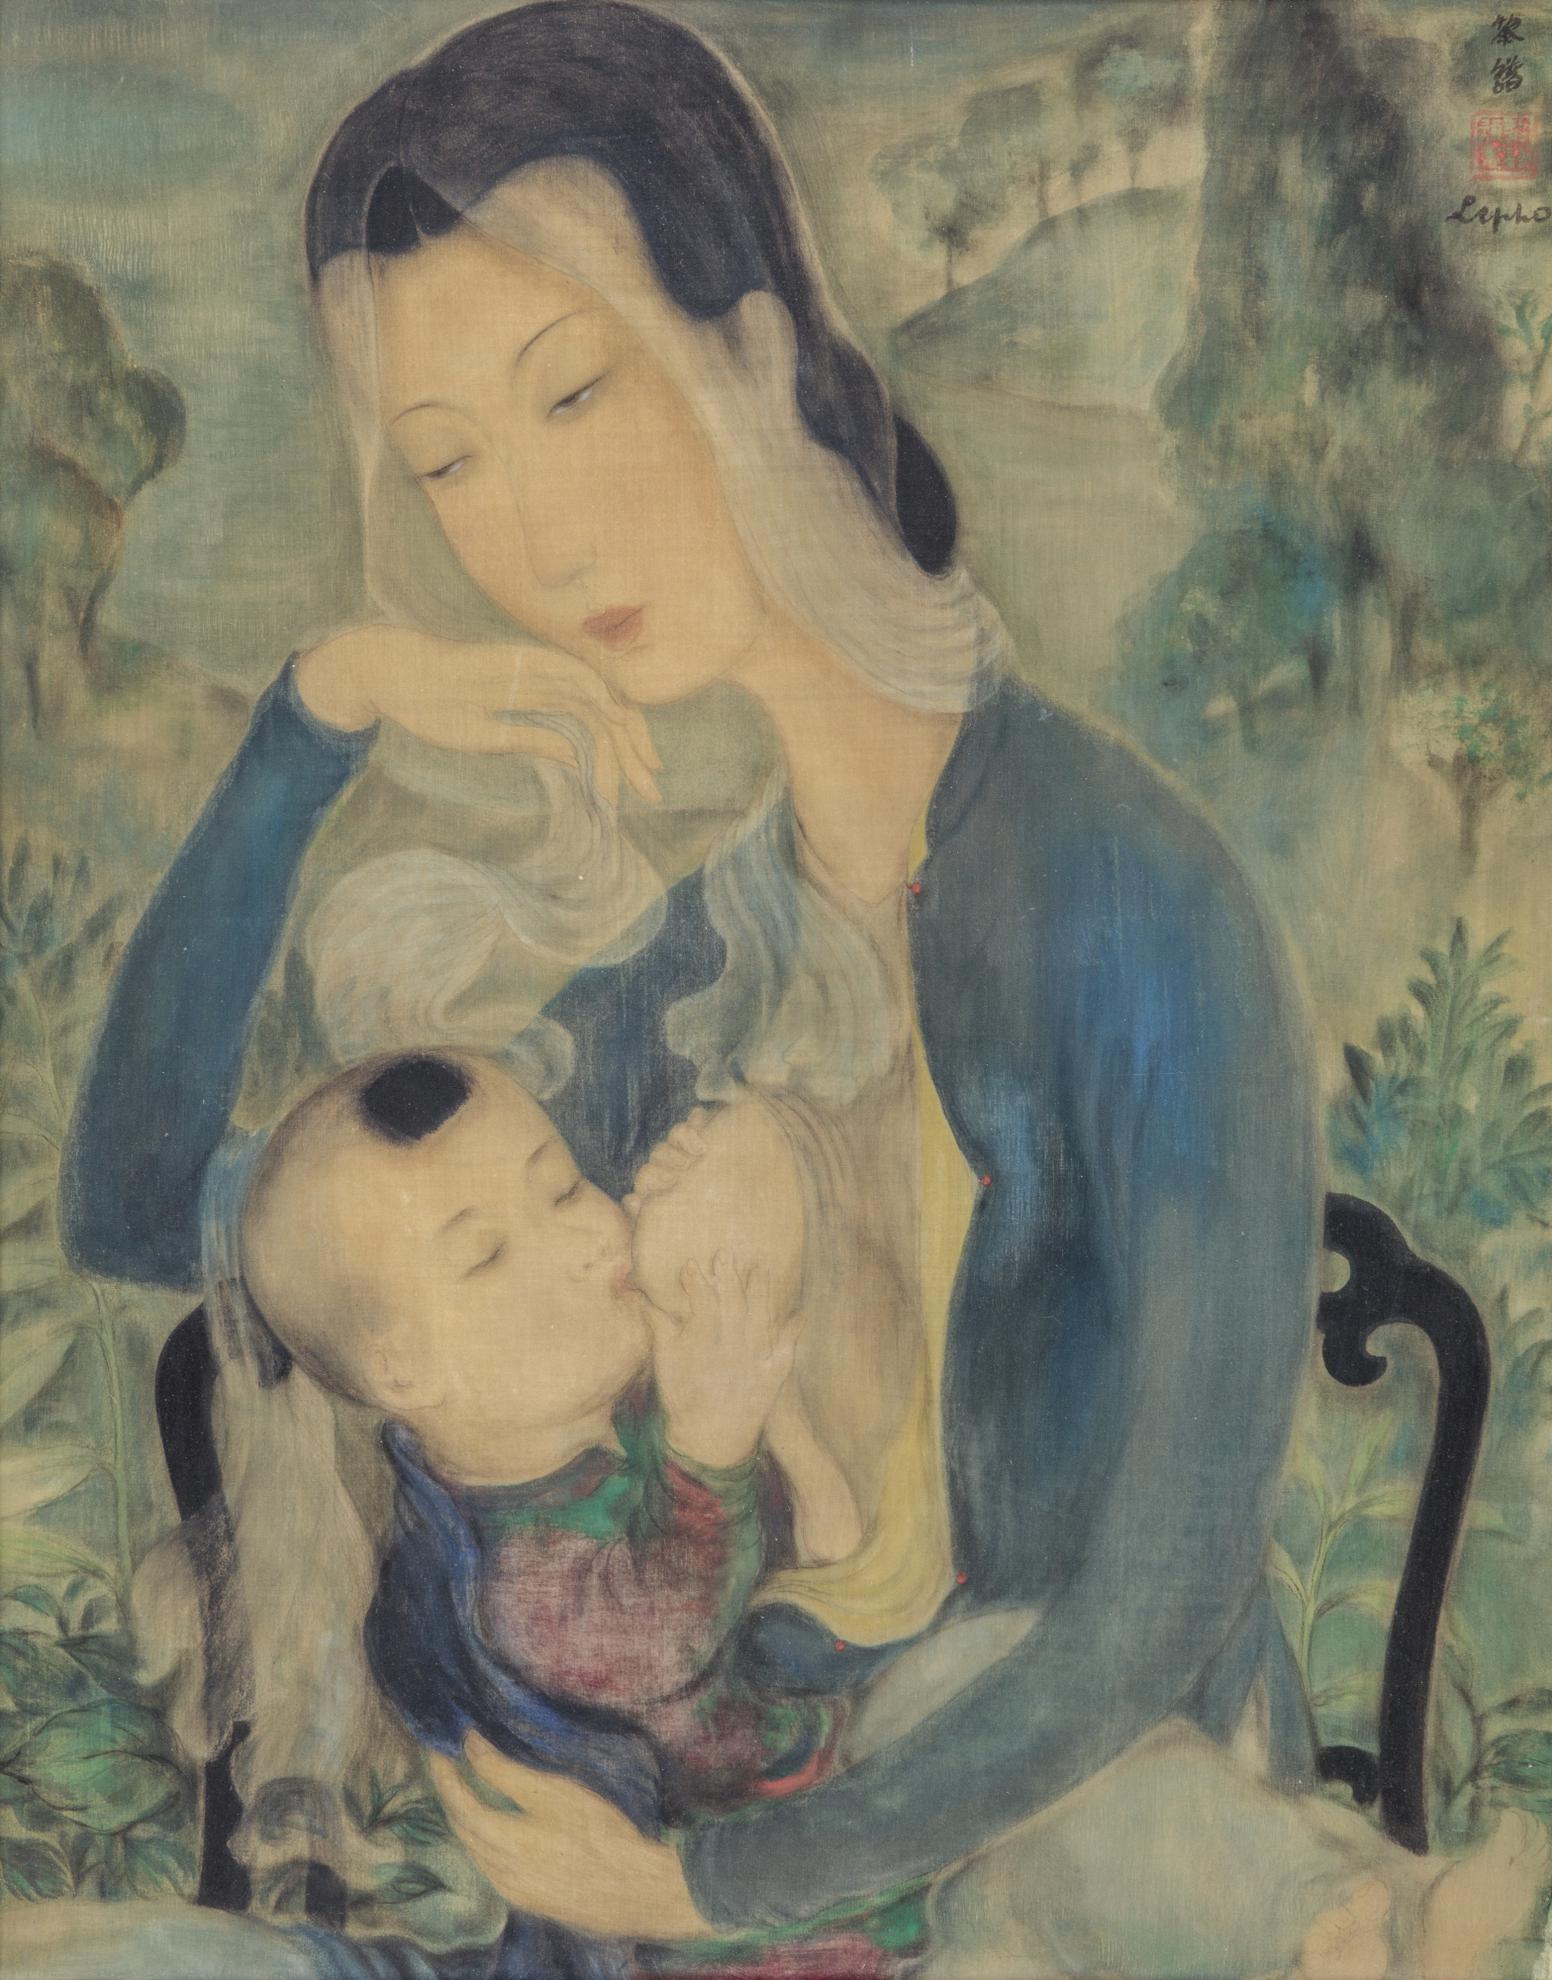 Le Pho-Maternite (Maternity)-1940